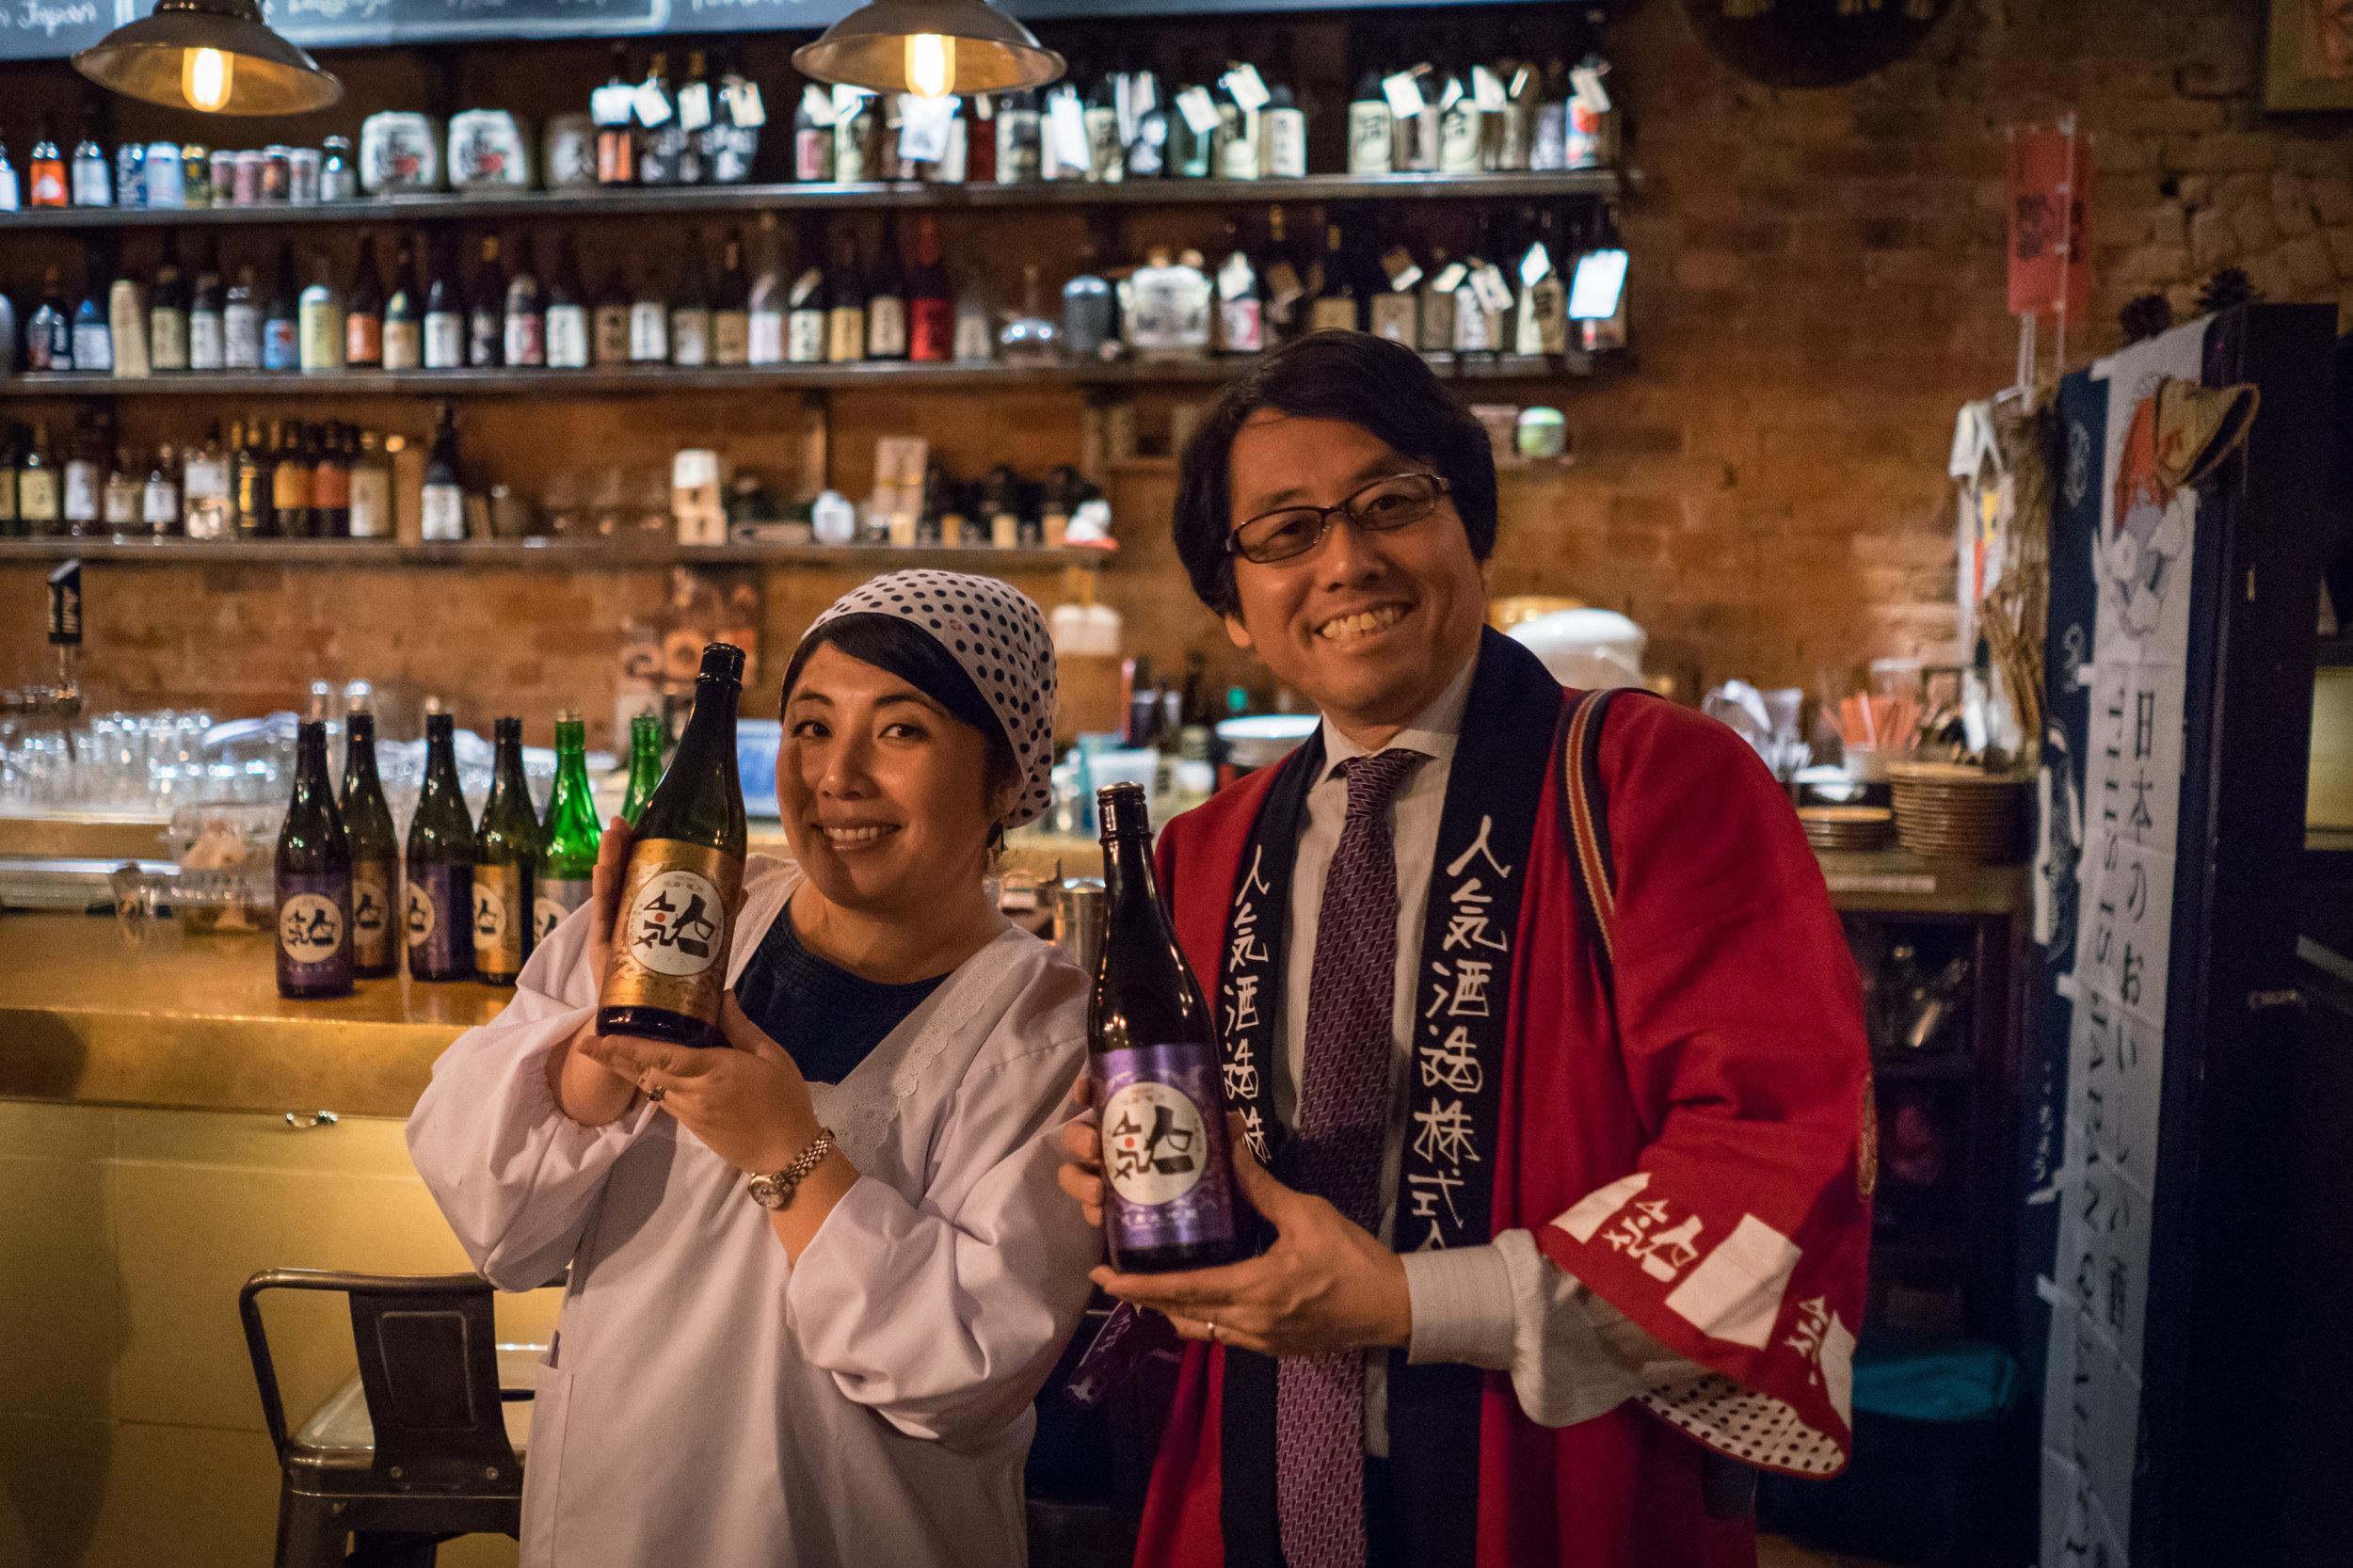 Brewery Owner, Yujin Yusa with Chizuko Niikwawa-Helton of Sake Discoveries